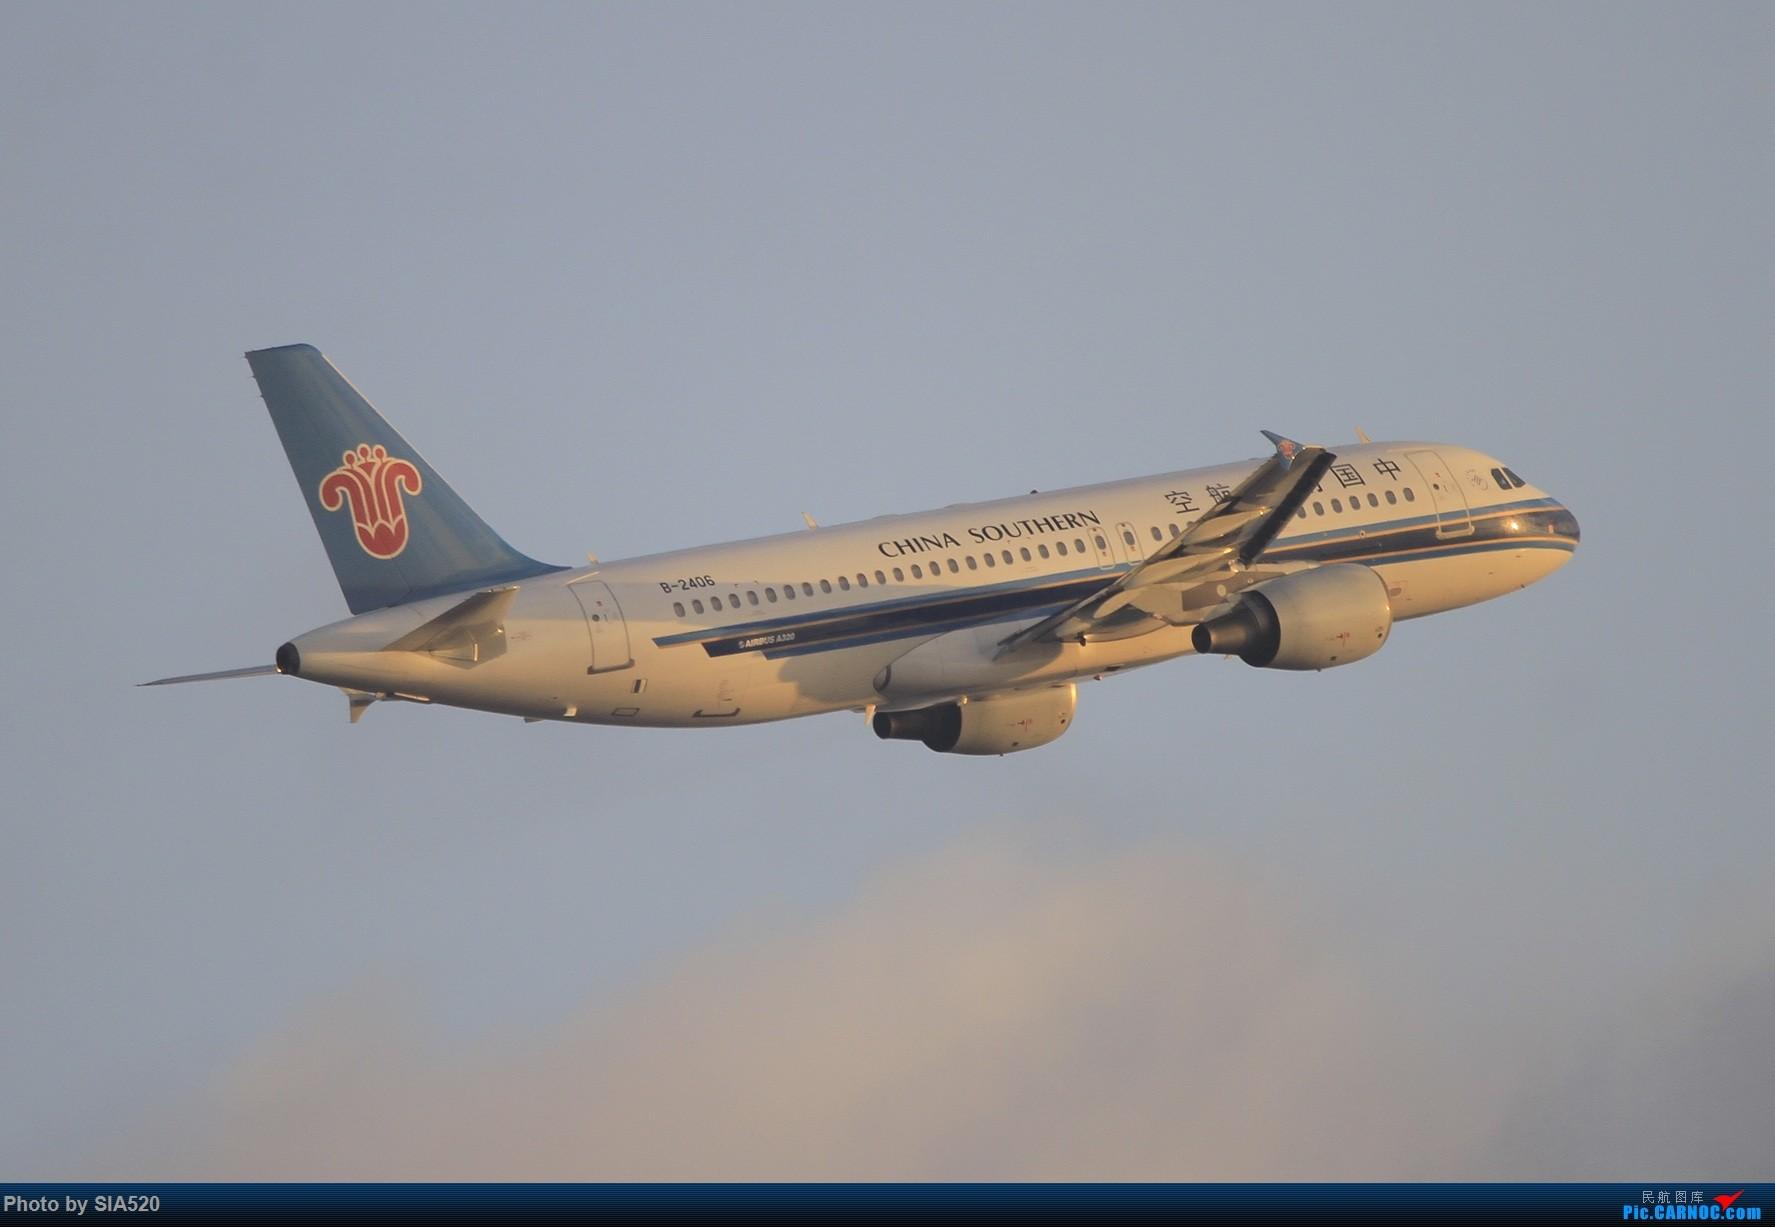 Re:[原创]北京人儿在三亚—600mm解锁凤凰 AIRBUS A320-200 B-2406 中国三亚凤凰国际机场